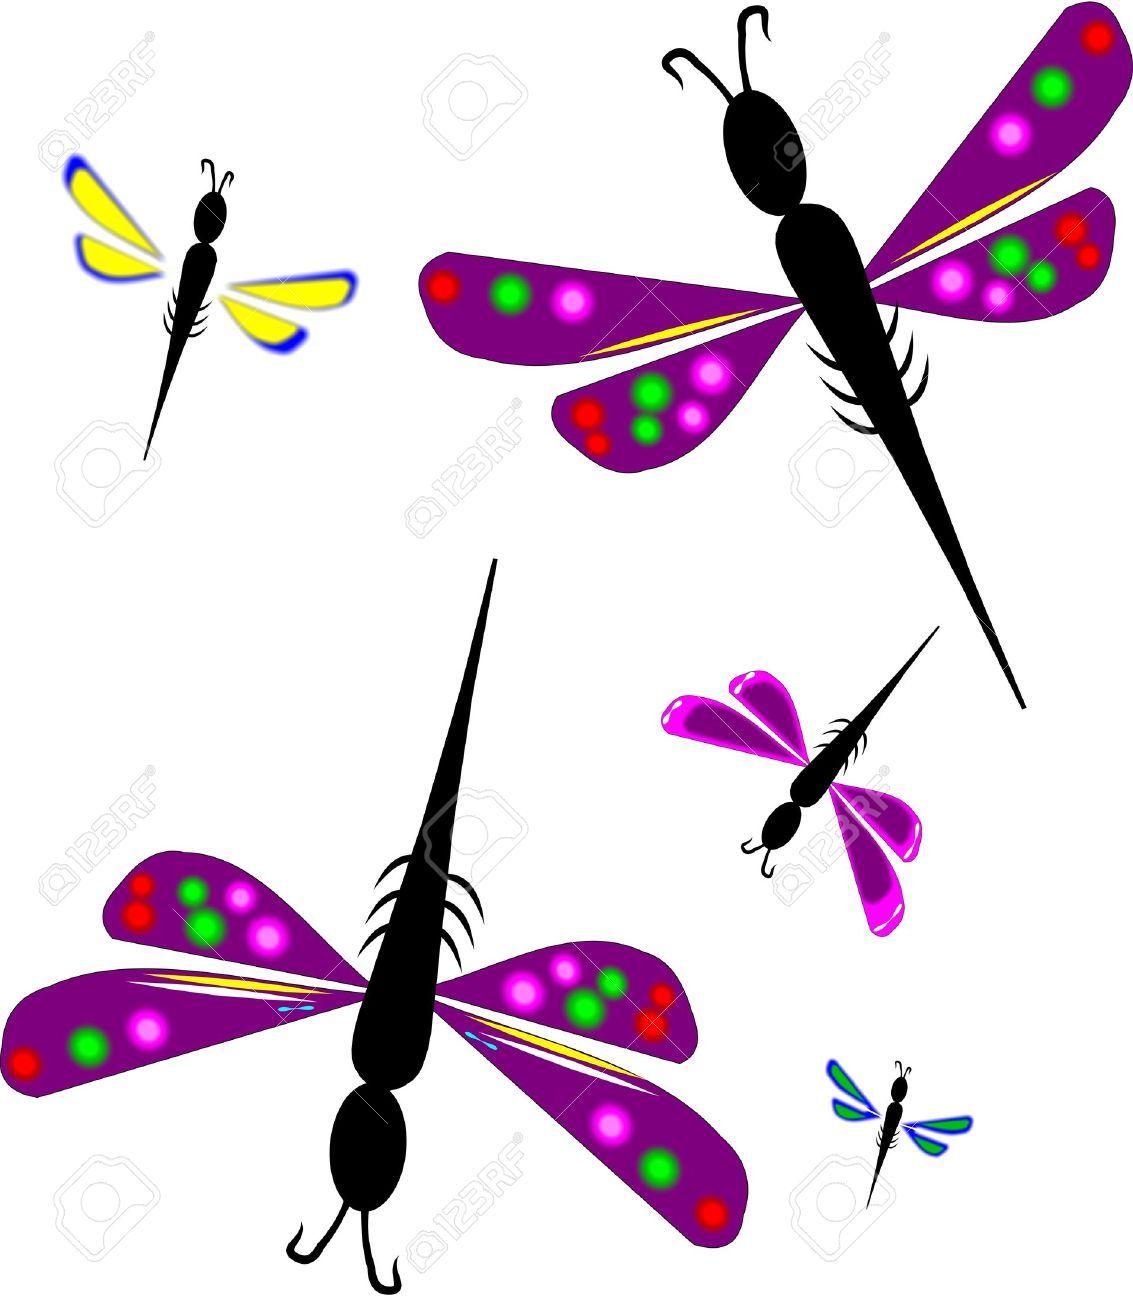 Mariposas para Colorear | Dibujos Online | Dibujos | Pinterest ...